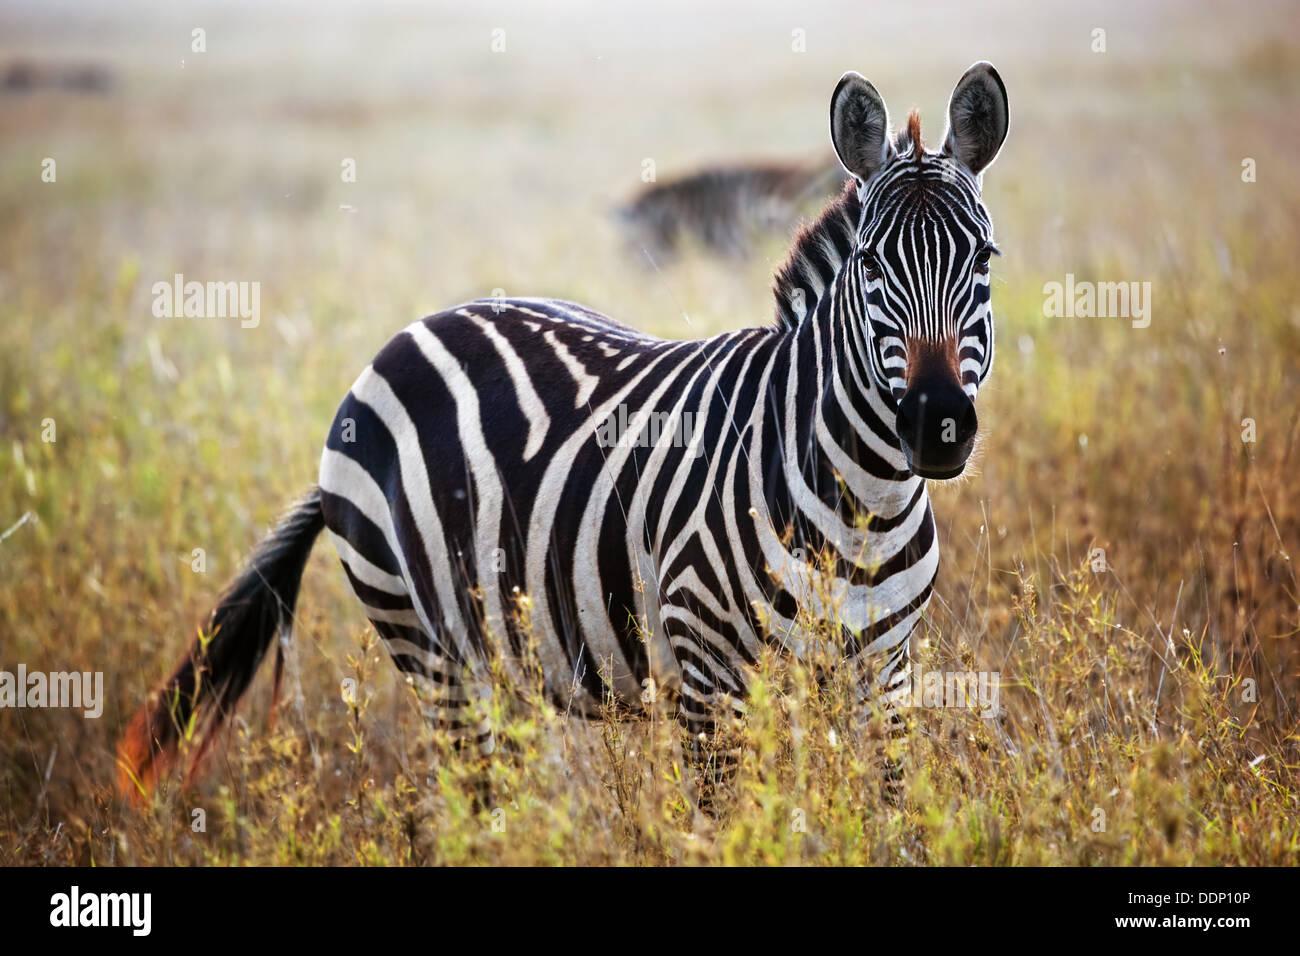 Zebra portrait on African savanna. Safari in Serengeti National Park, Tanzania - Stock Image